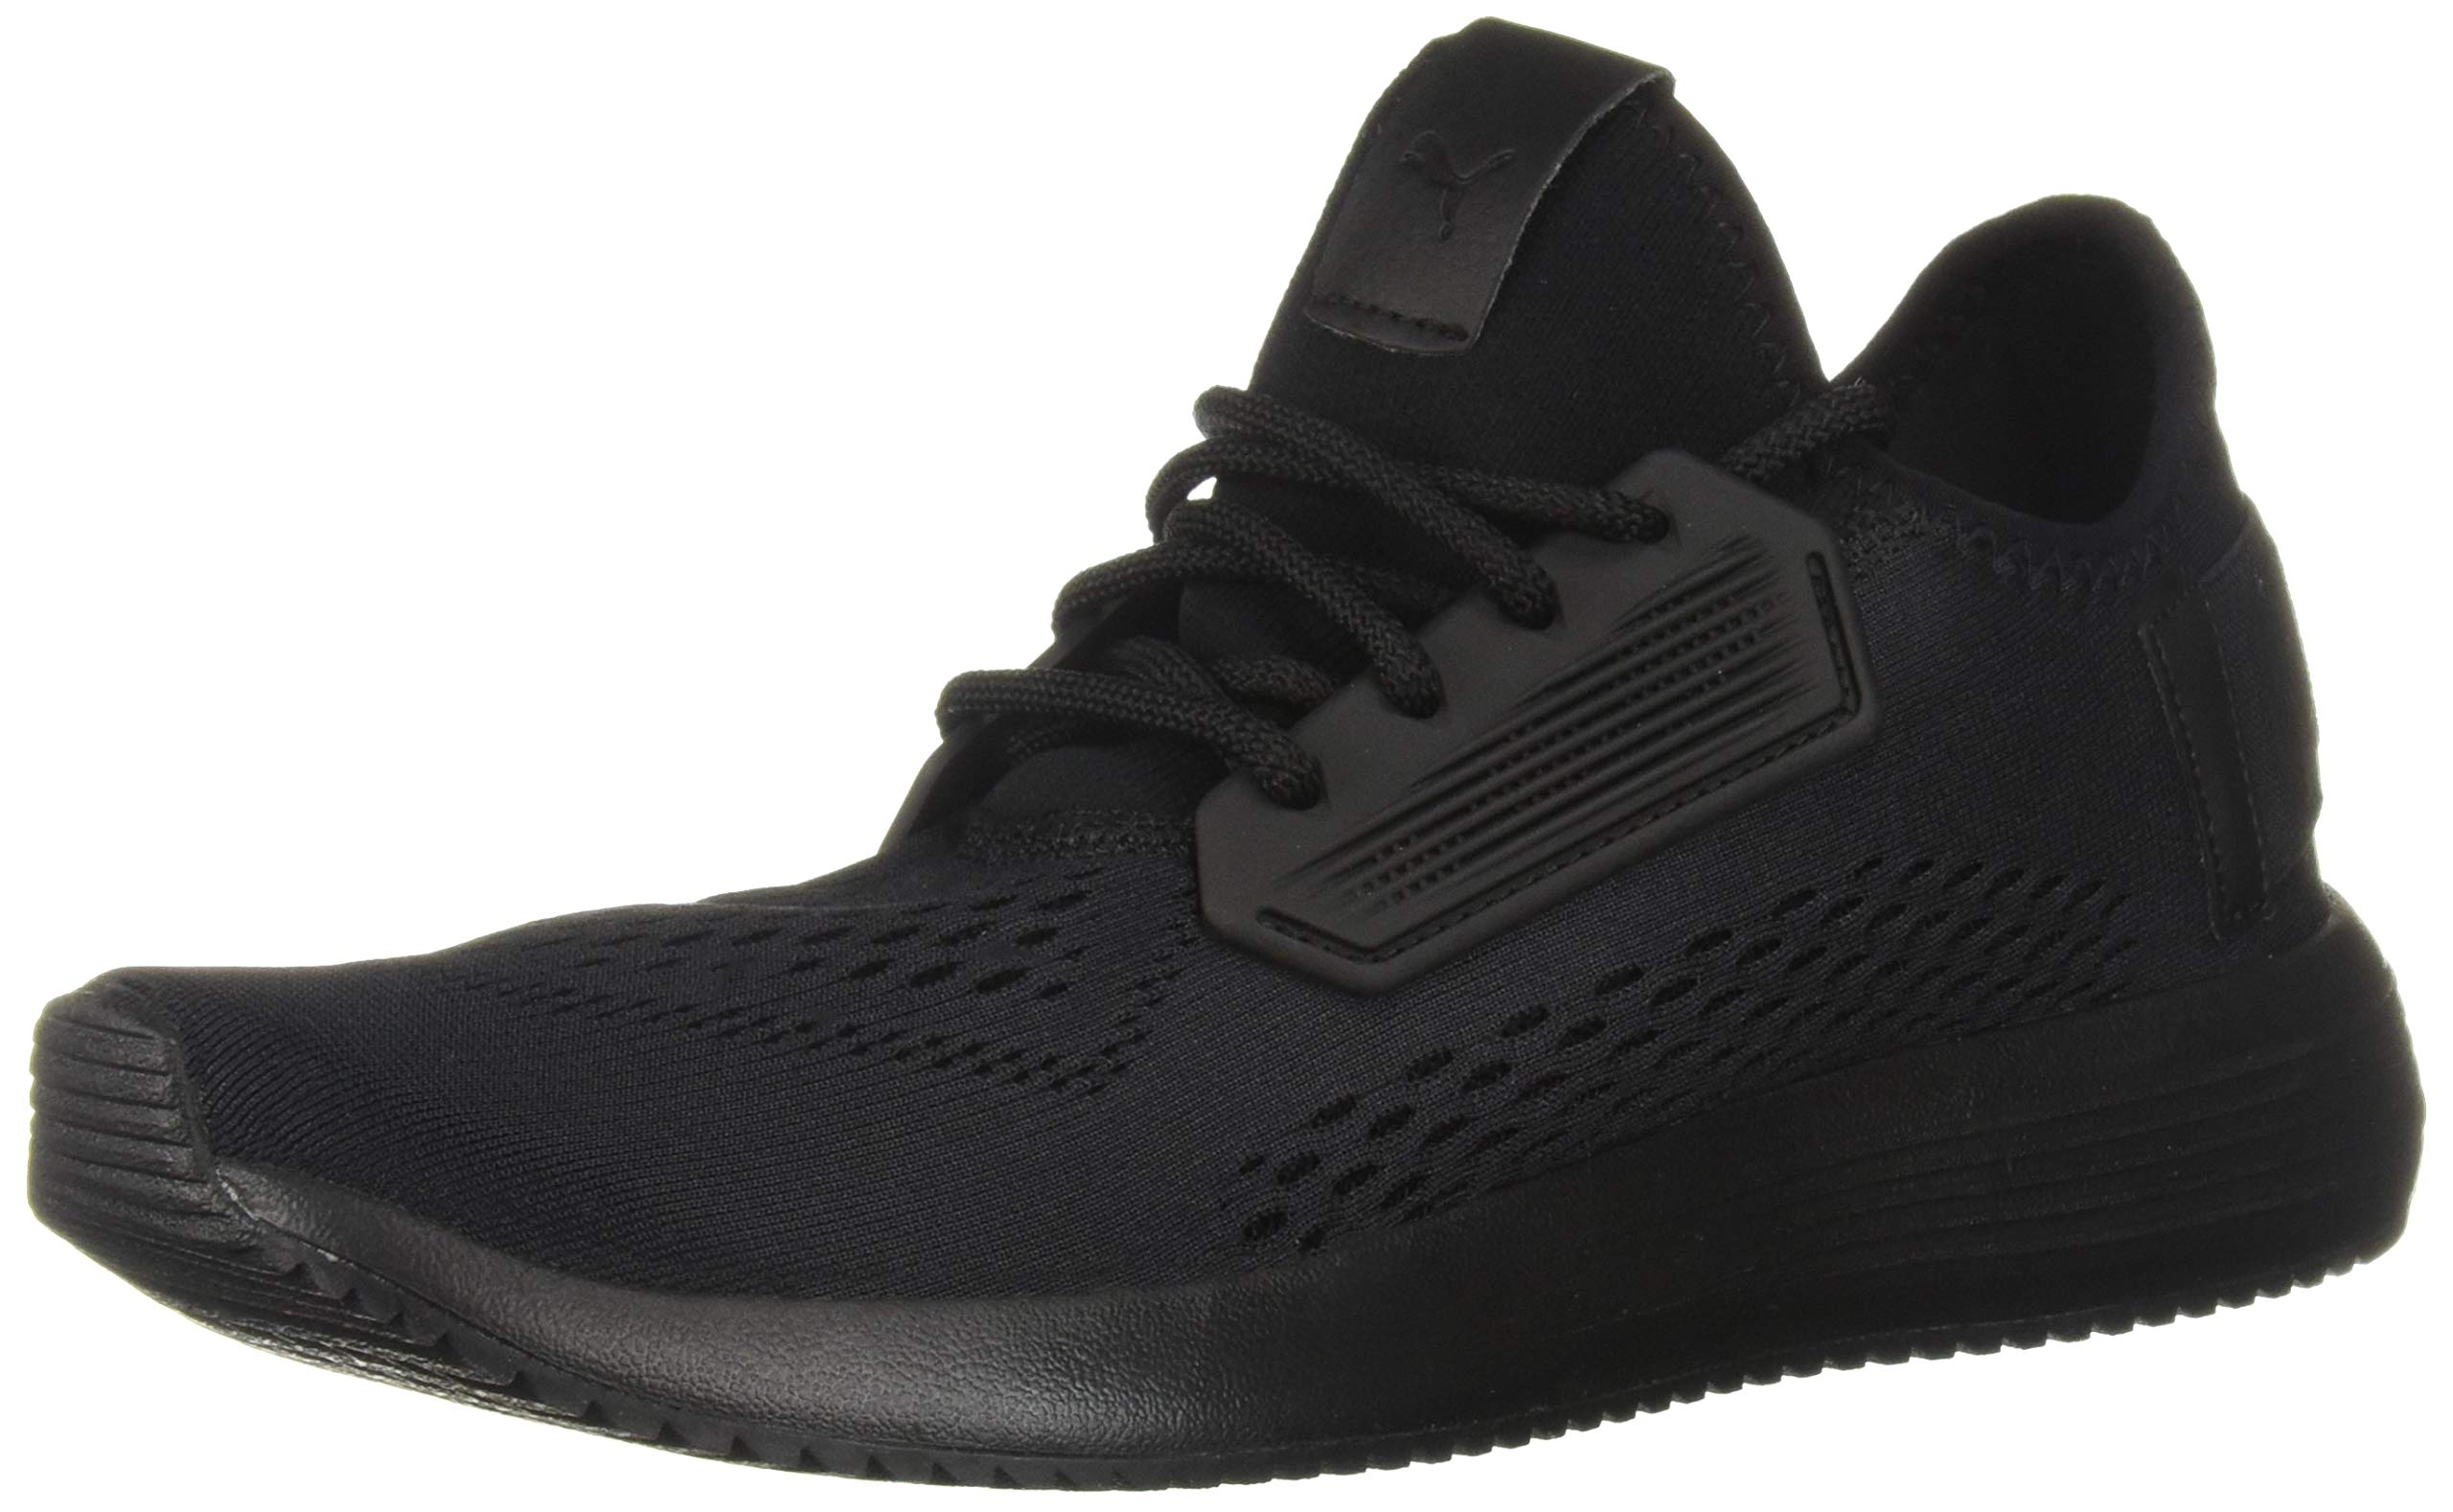 PUMA Uprise Mesh Sneaker- Buy Online in